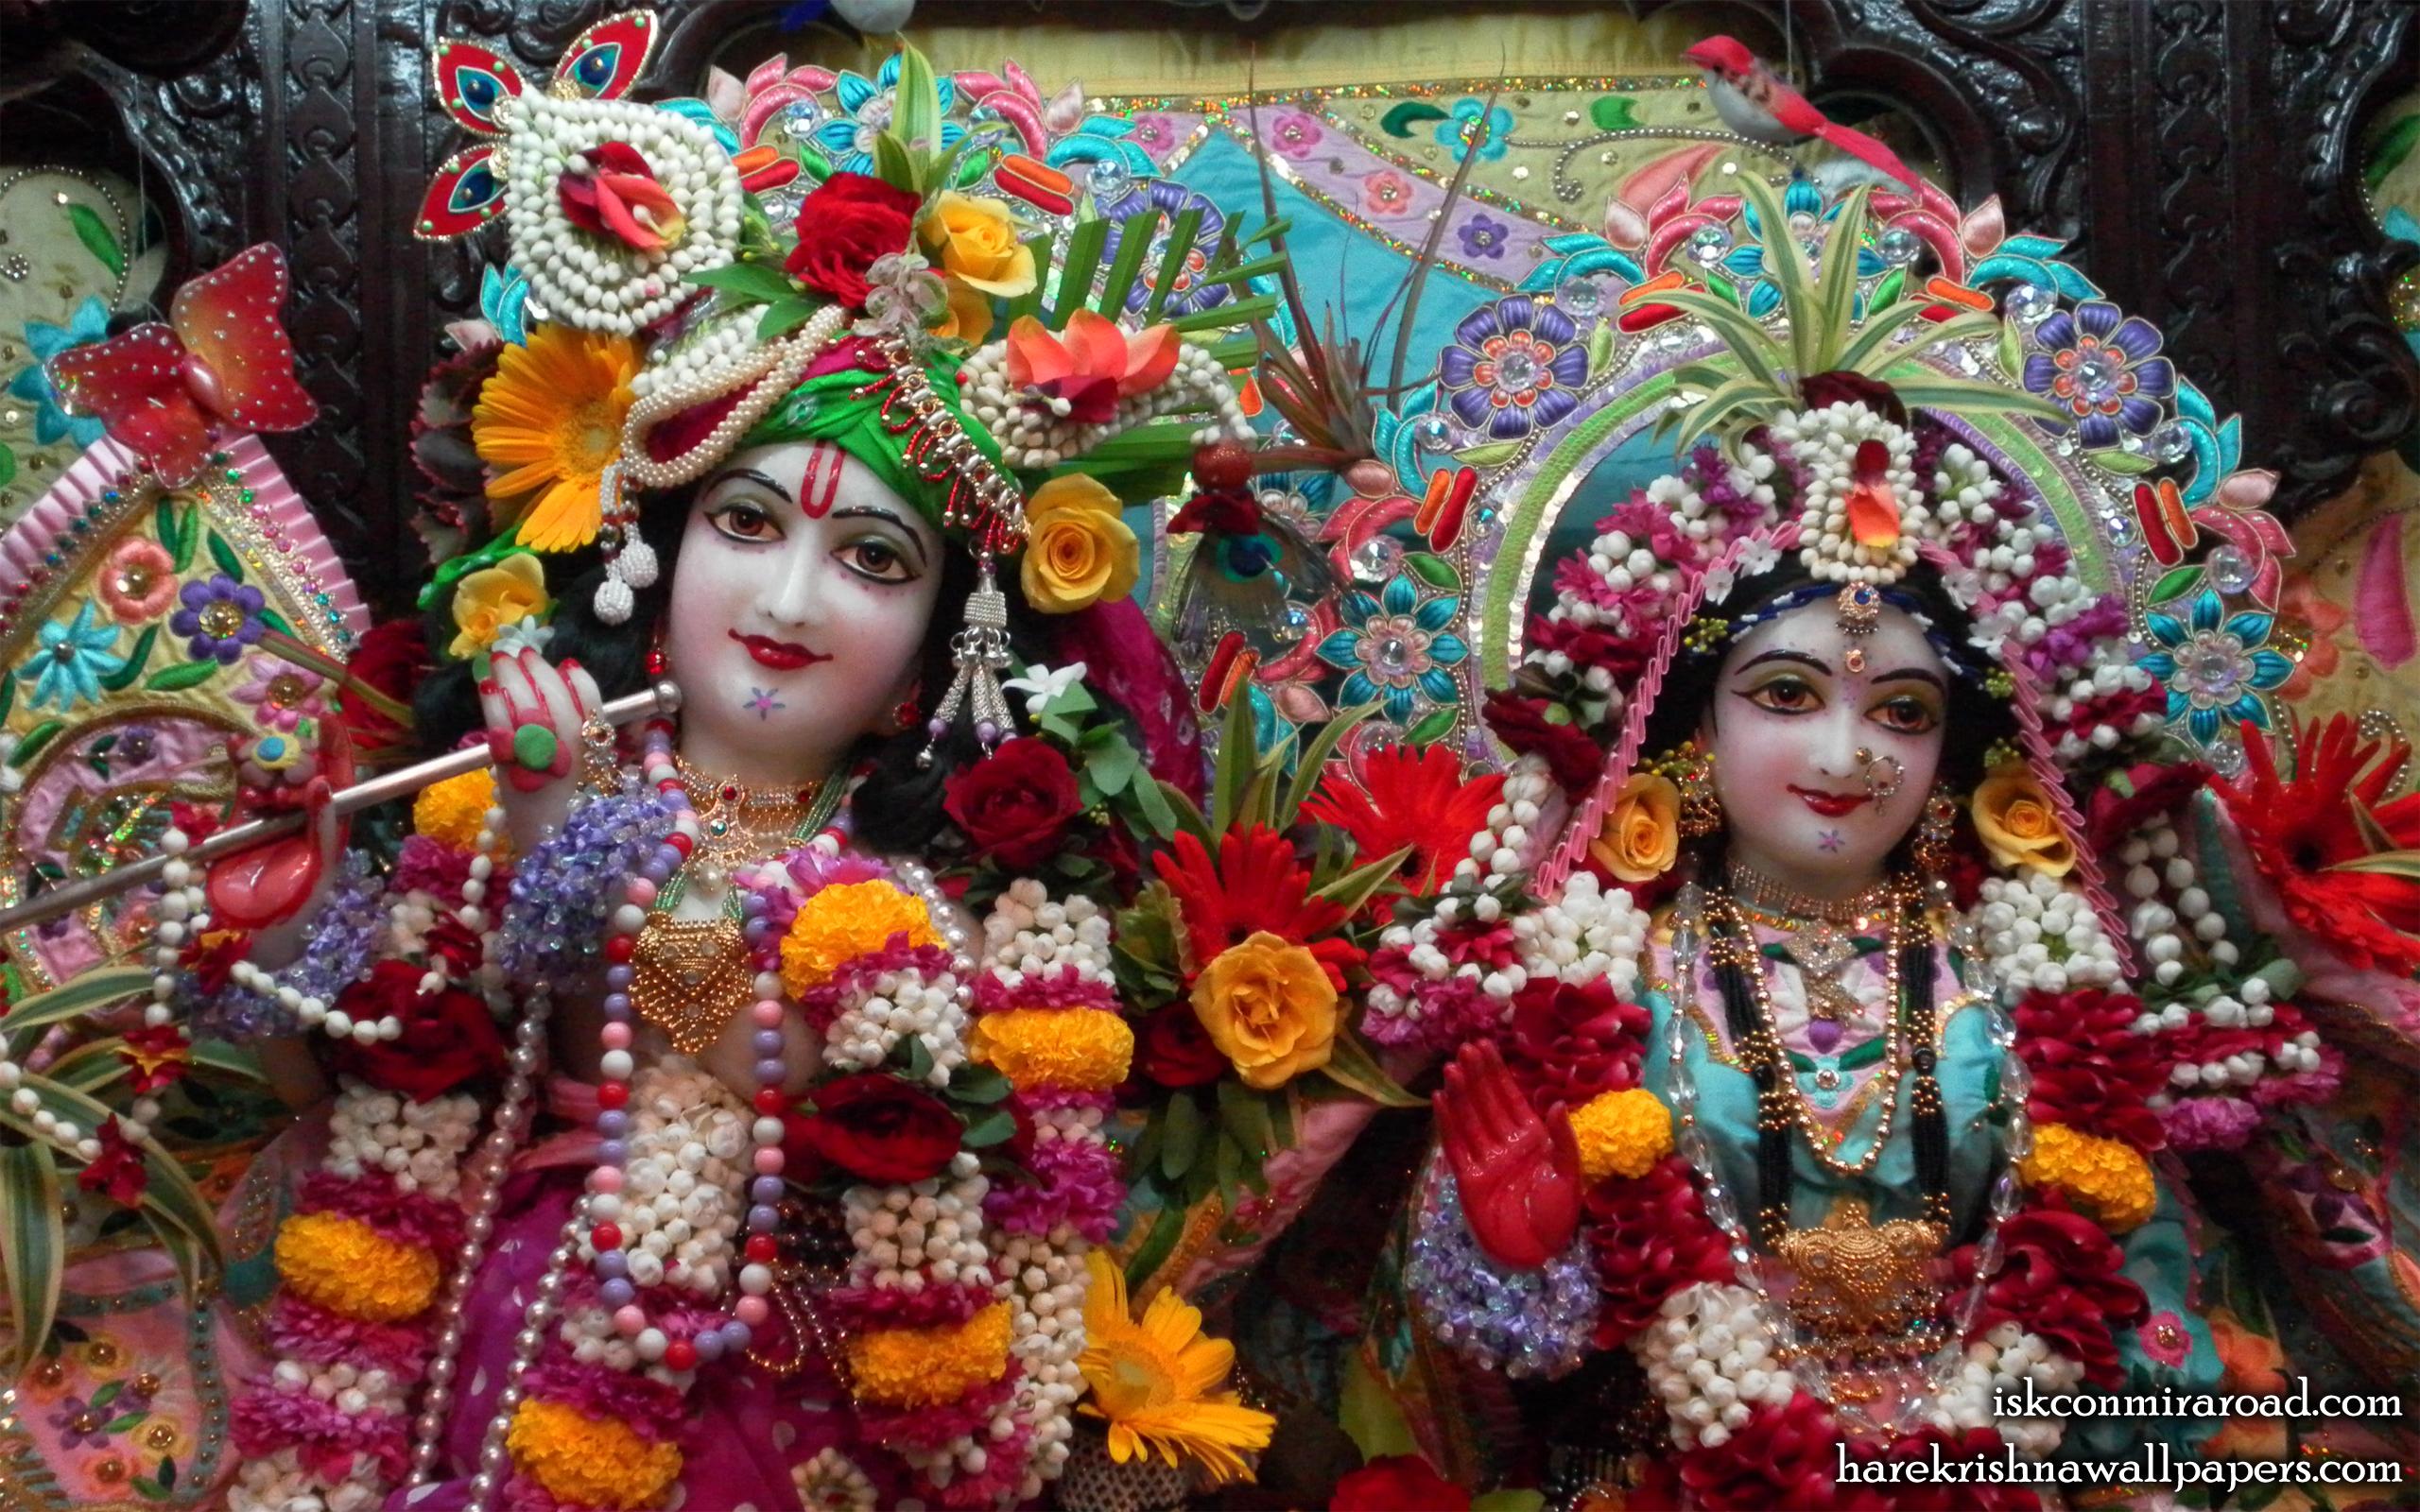 Sri Sri Radha Giridhari Close up Wallpaper (012) Size 2560x1600 Download